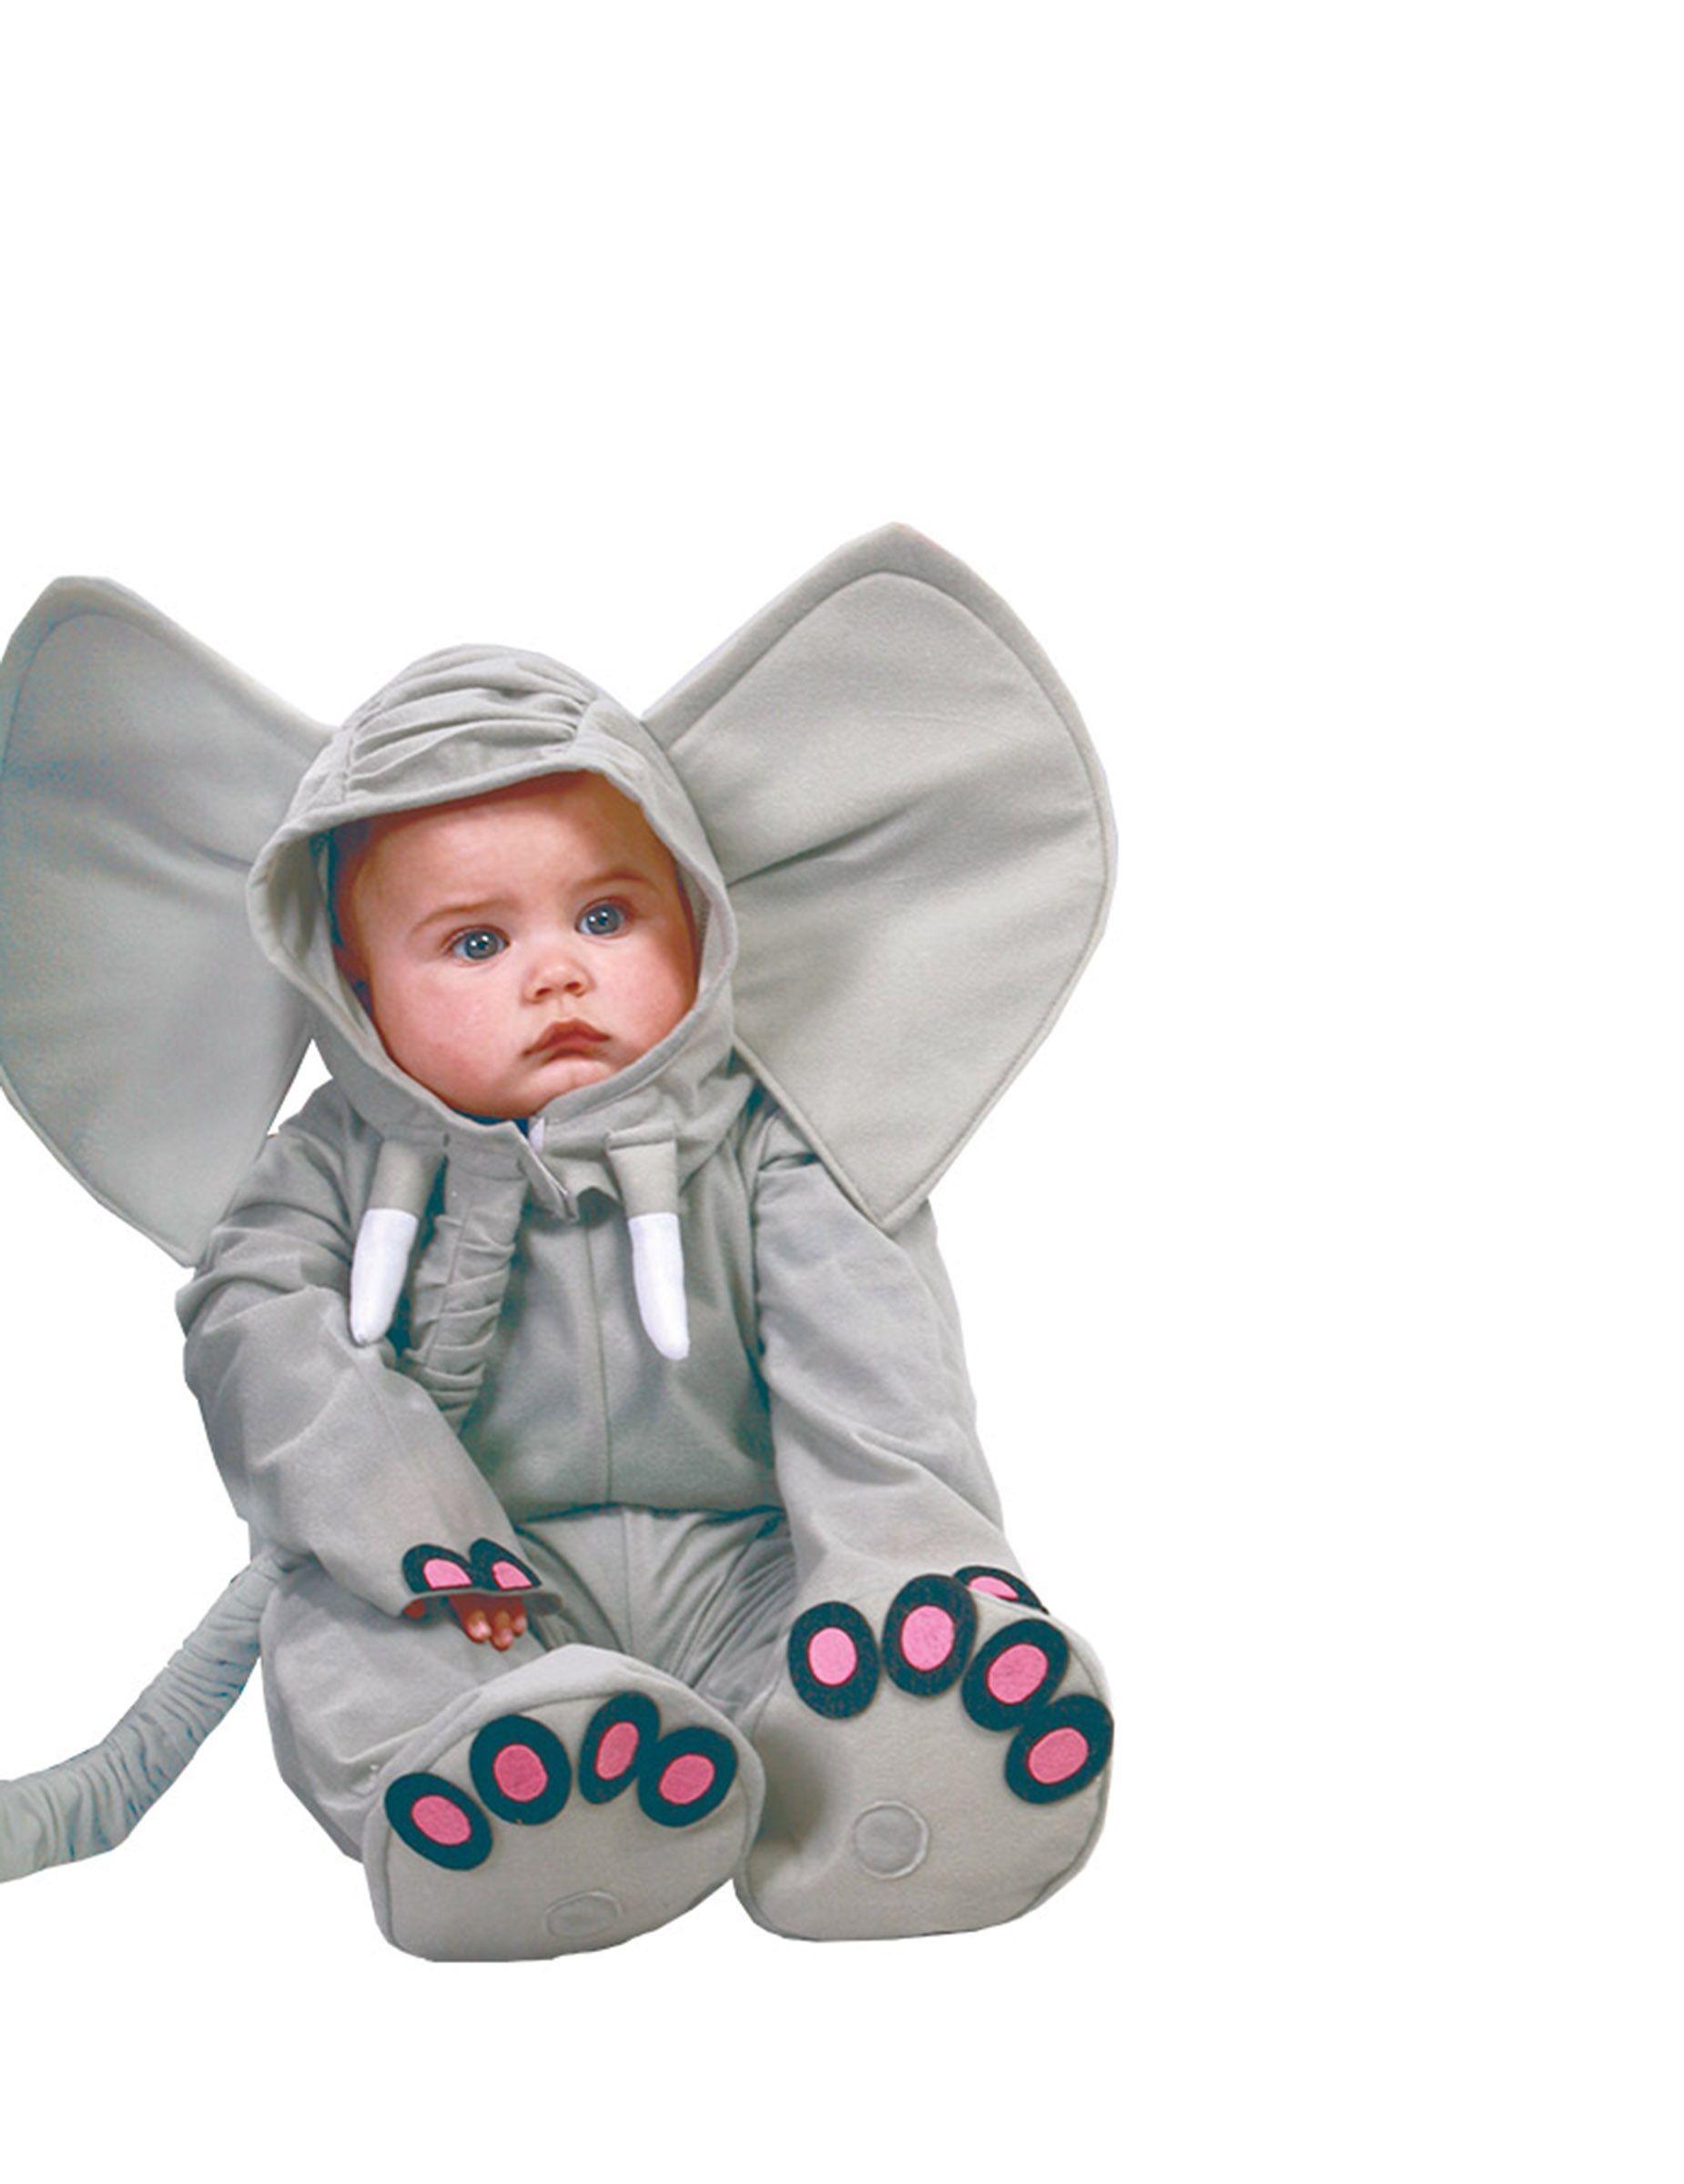 f769fede1ea Kostume elefant grå til baby | Fastelavn | Kostumer, Baby og Elefant